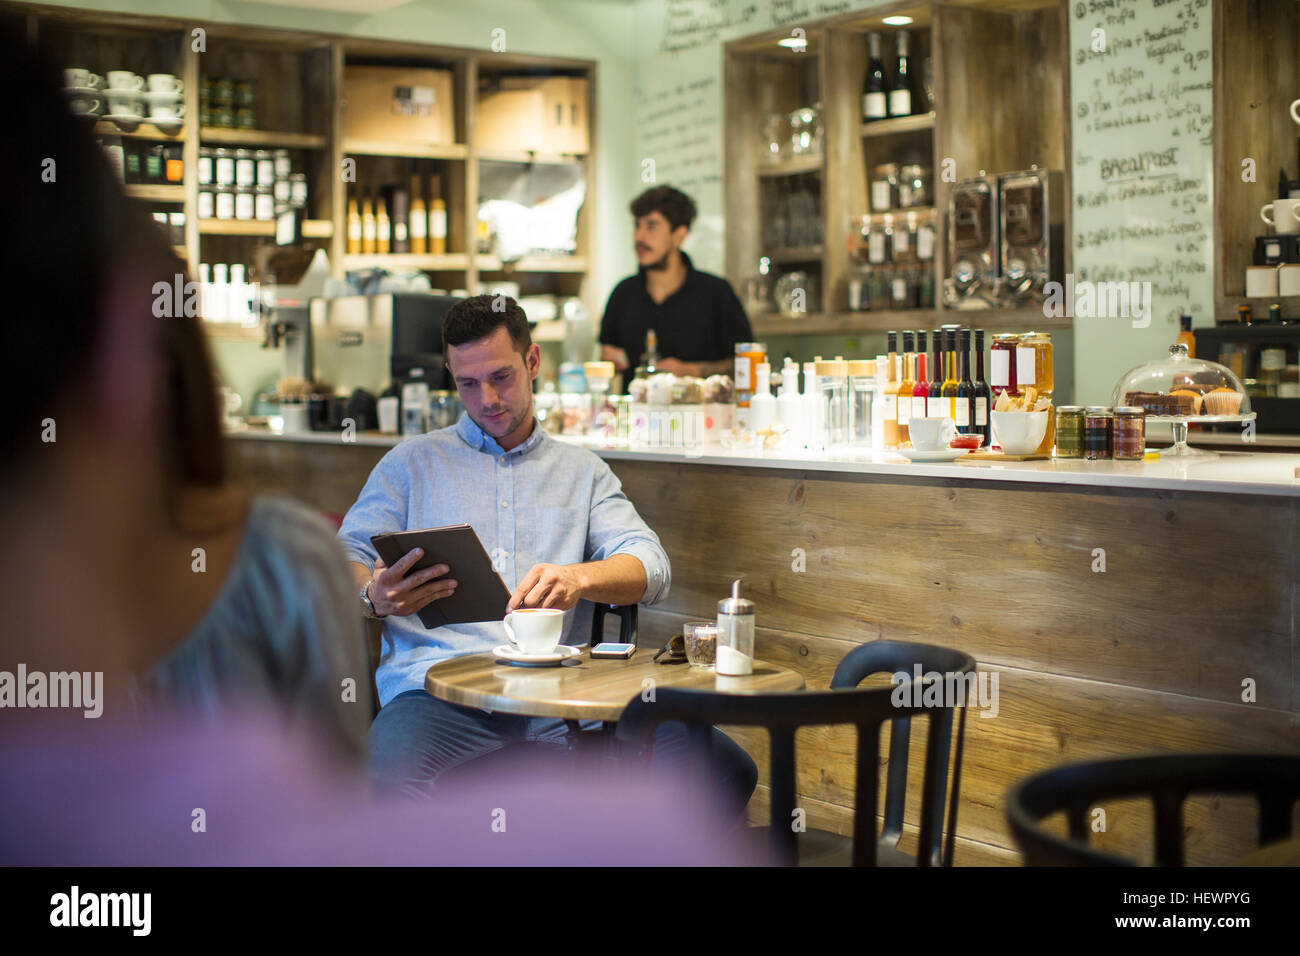 Man sitting in cafe browsing digital tablet - Stock Image